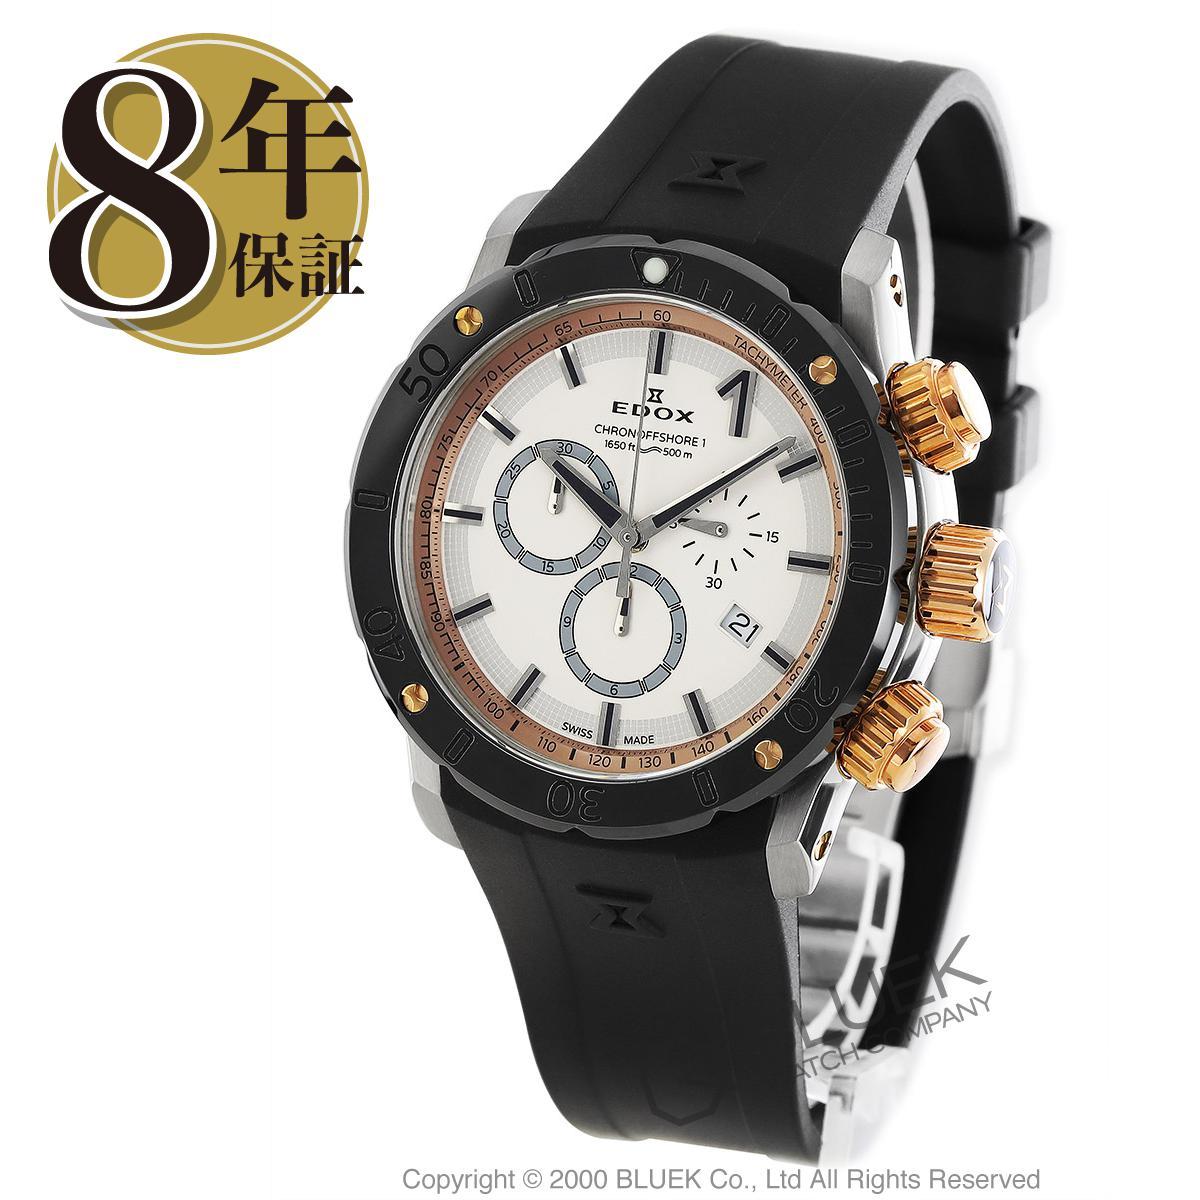 caa7a56378d3 エドックス クロノオフショア1 クロノグラフ 500m防水 腕時計 メンズ EDOX 10221-357R-BINR